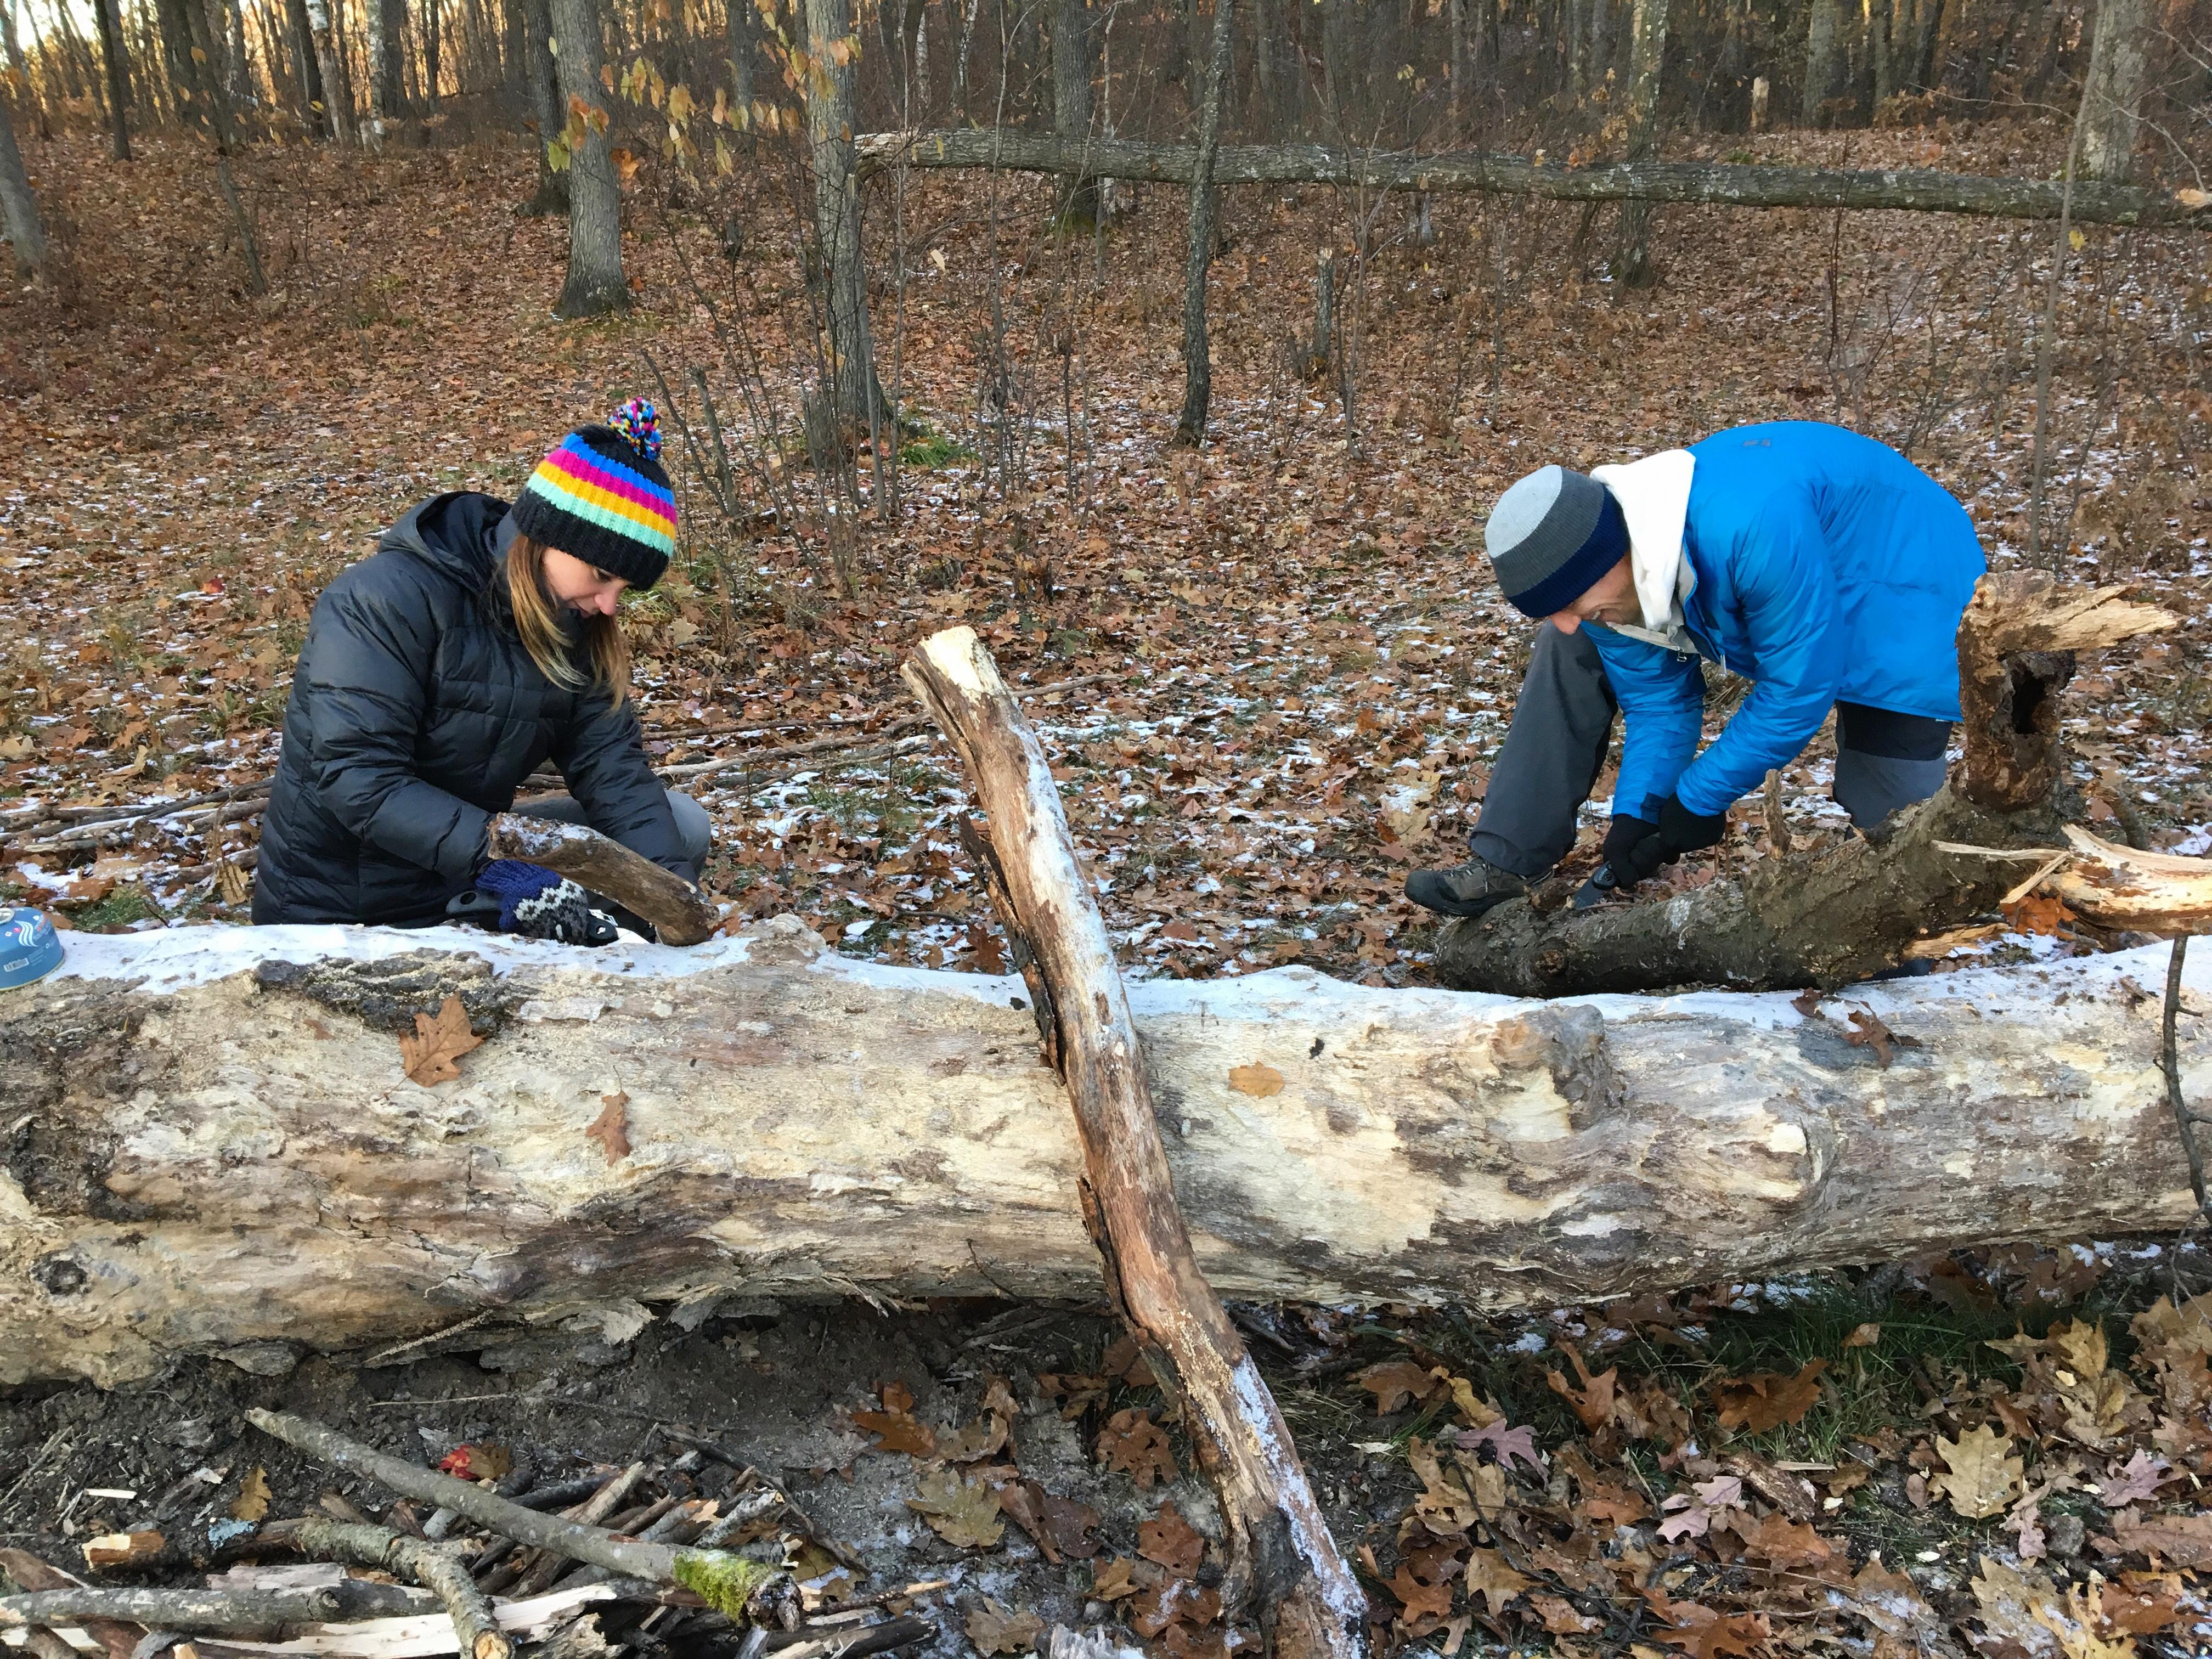 camp-firewood-cold-hiking-hoist-michigan